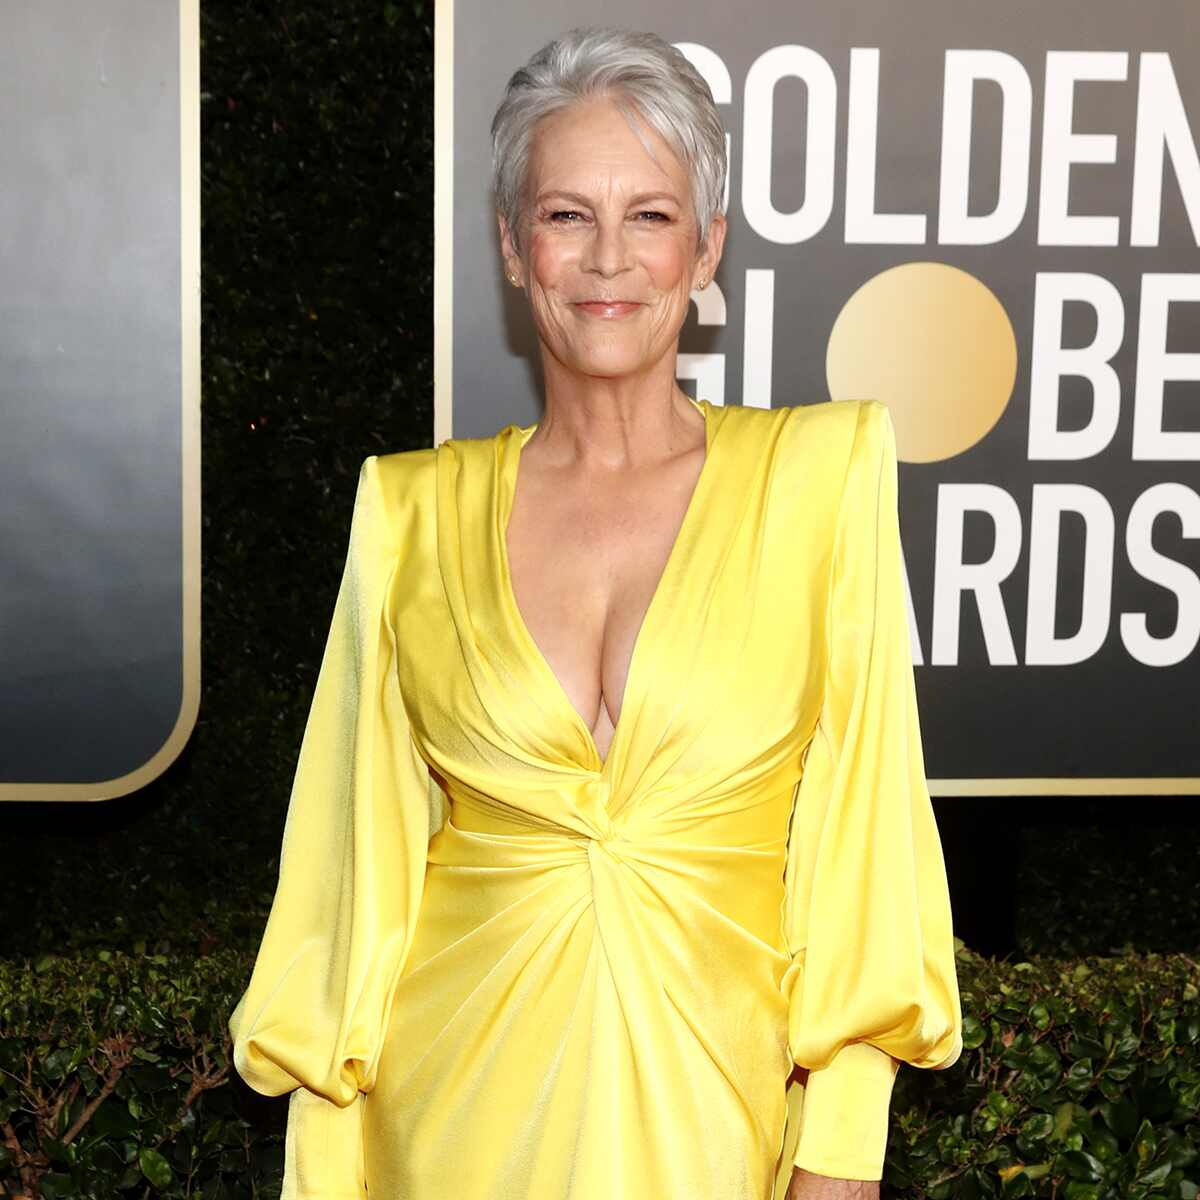 Jamie Lee Curtis, 2021 Golden Globe Awards, Arrivals, Red Carpet Fashion